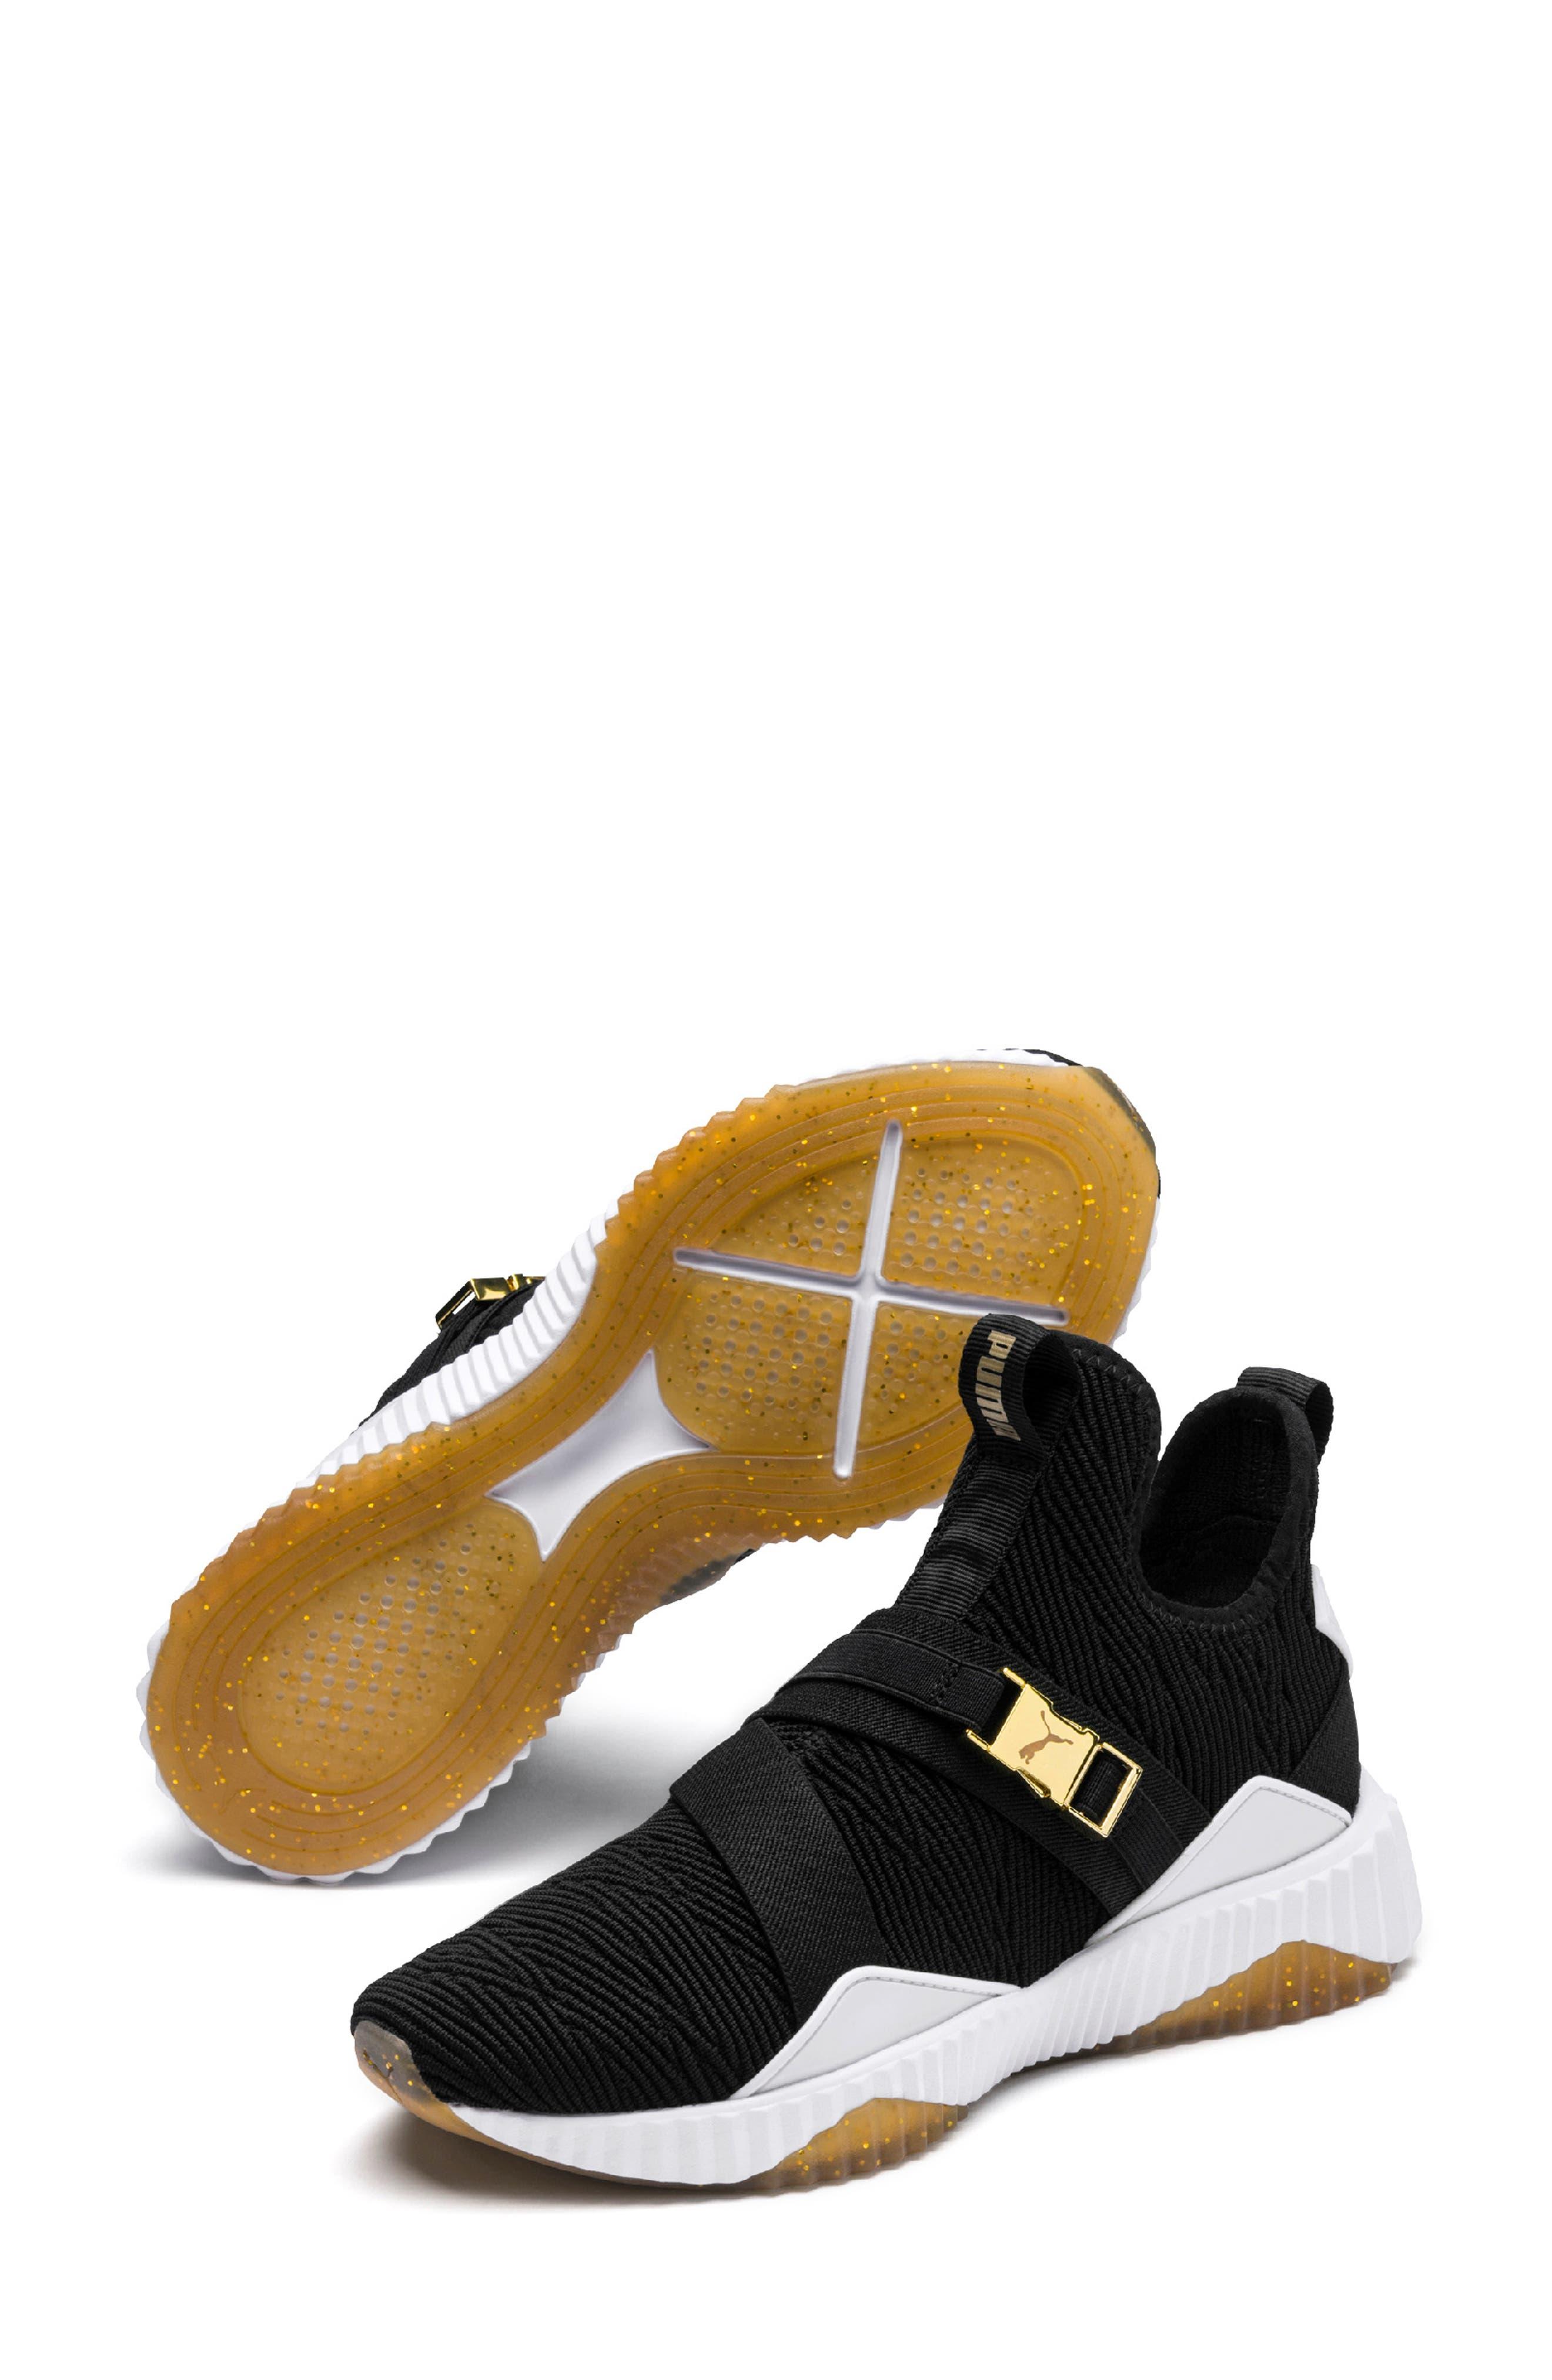 Defy Mid Varsity Sneaker,                             Main thumbnail 1, color,                             PUMA BLACK/ METALLIC GOLD